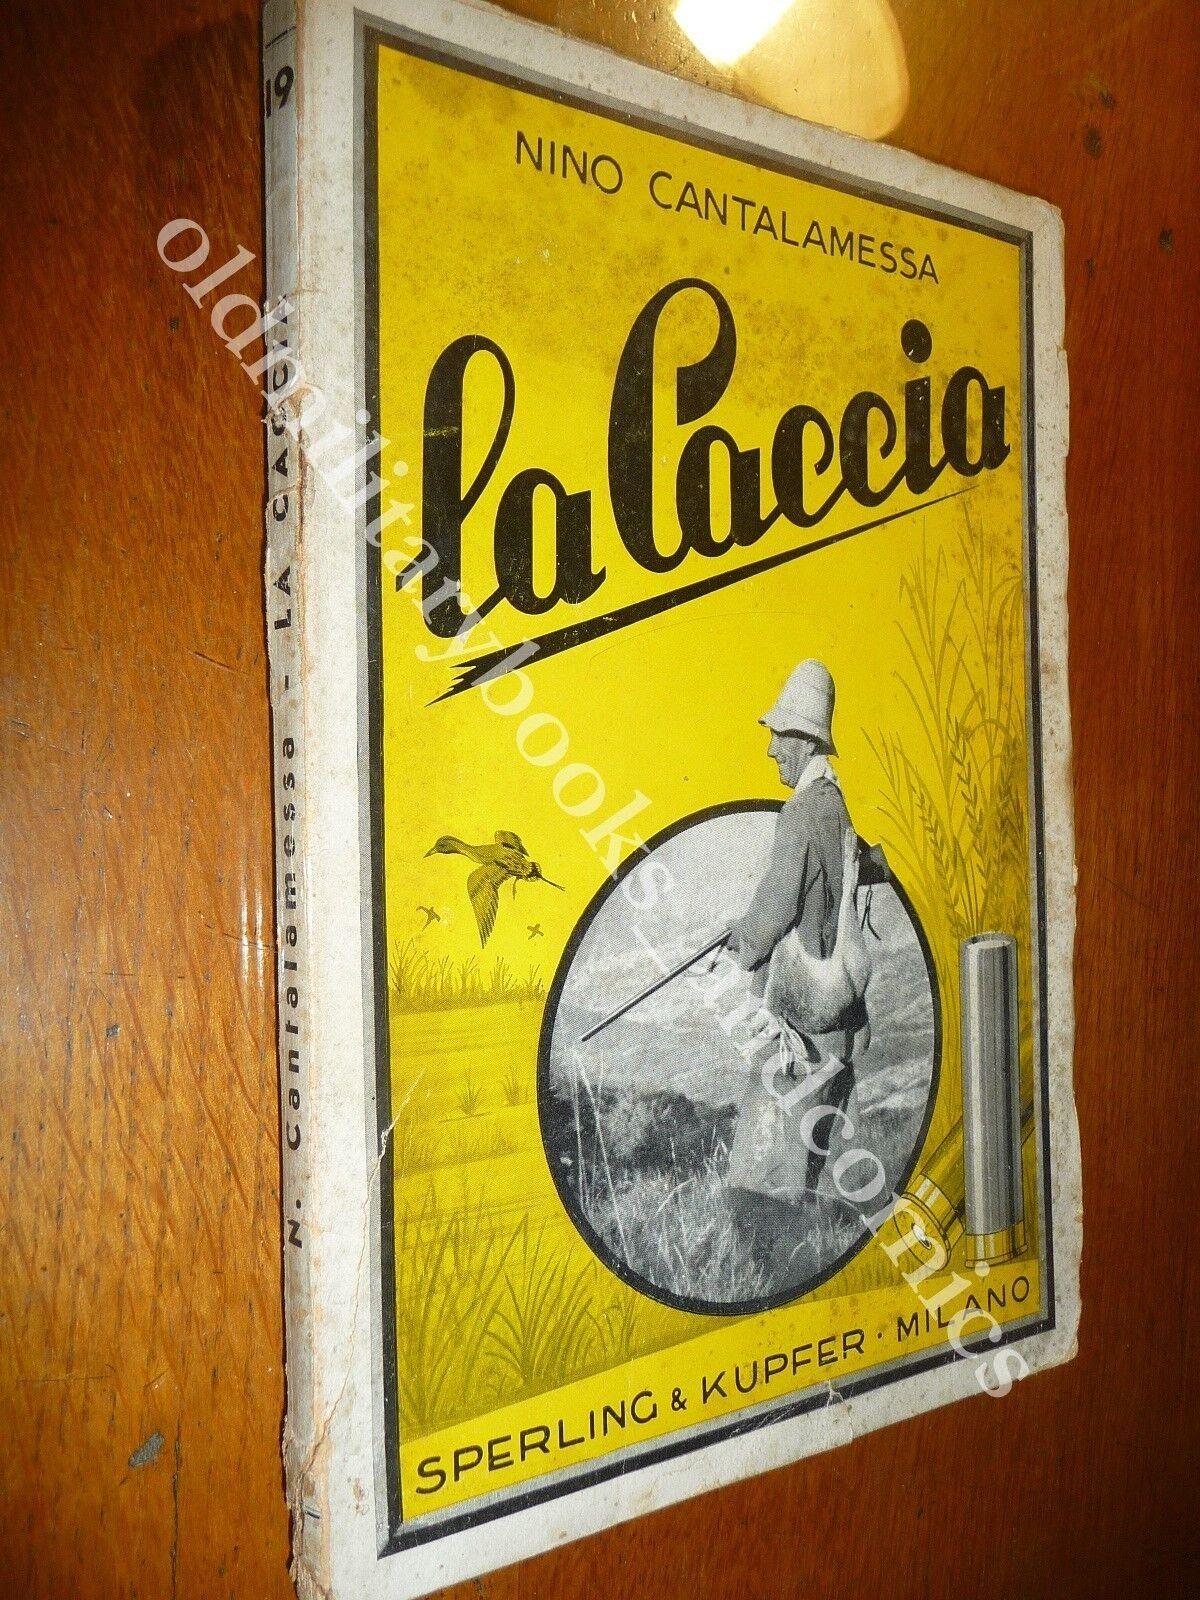 LA CACCIA NINO CANTALAMESSA SPERLING & KUPFER I^ Ed. 1950 INTERESSANTE VOLUME